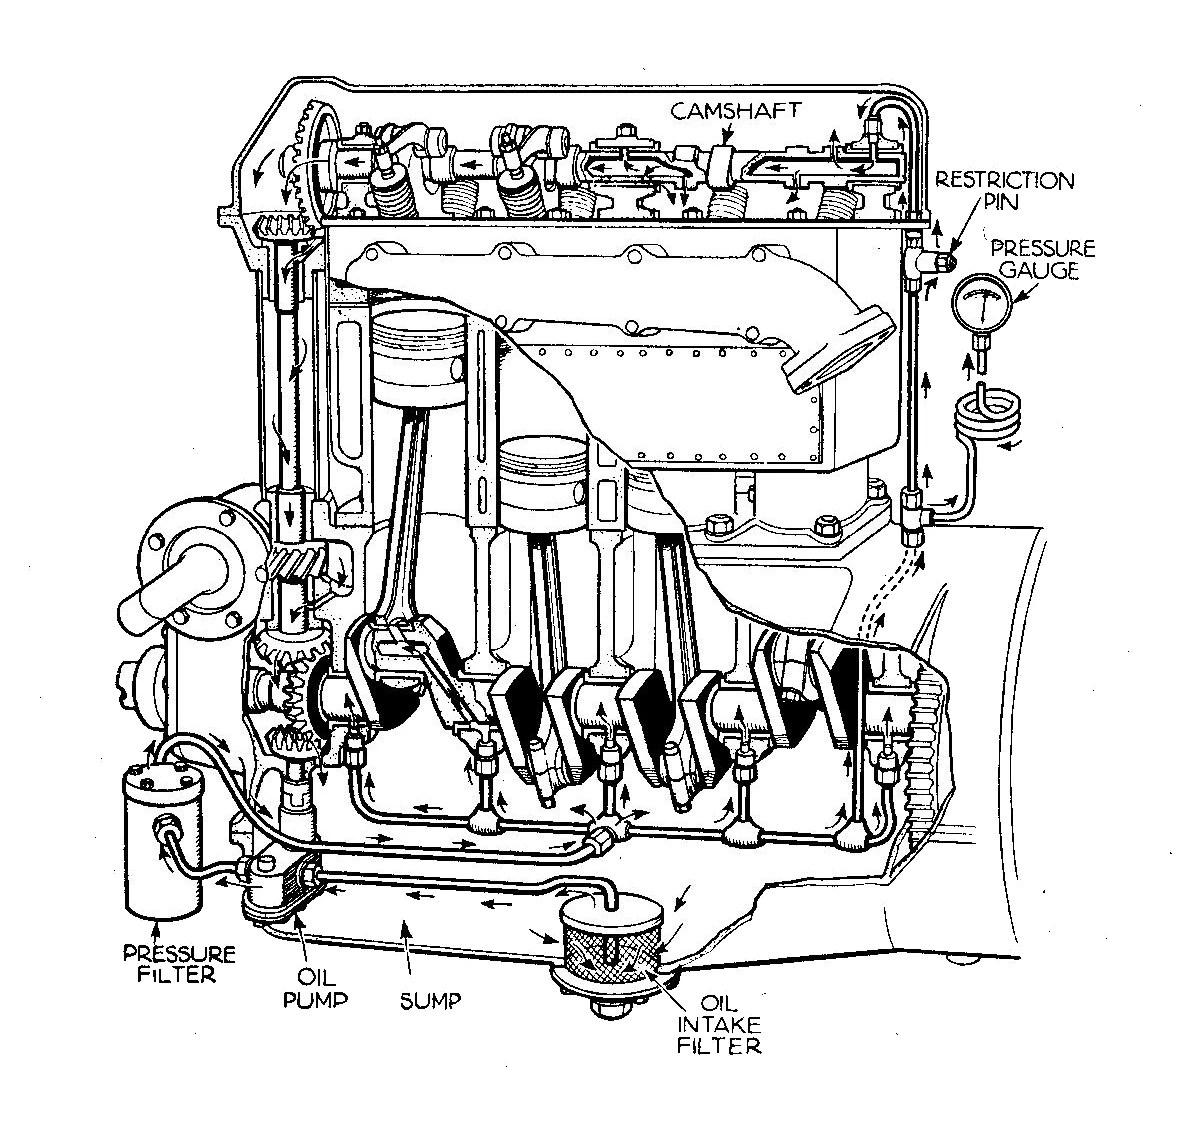 Oil Pump Internal Combustion Engine